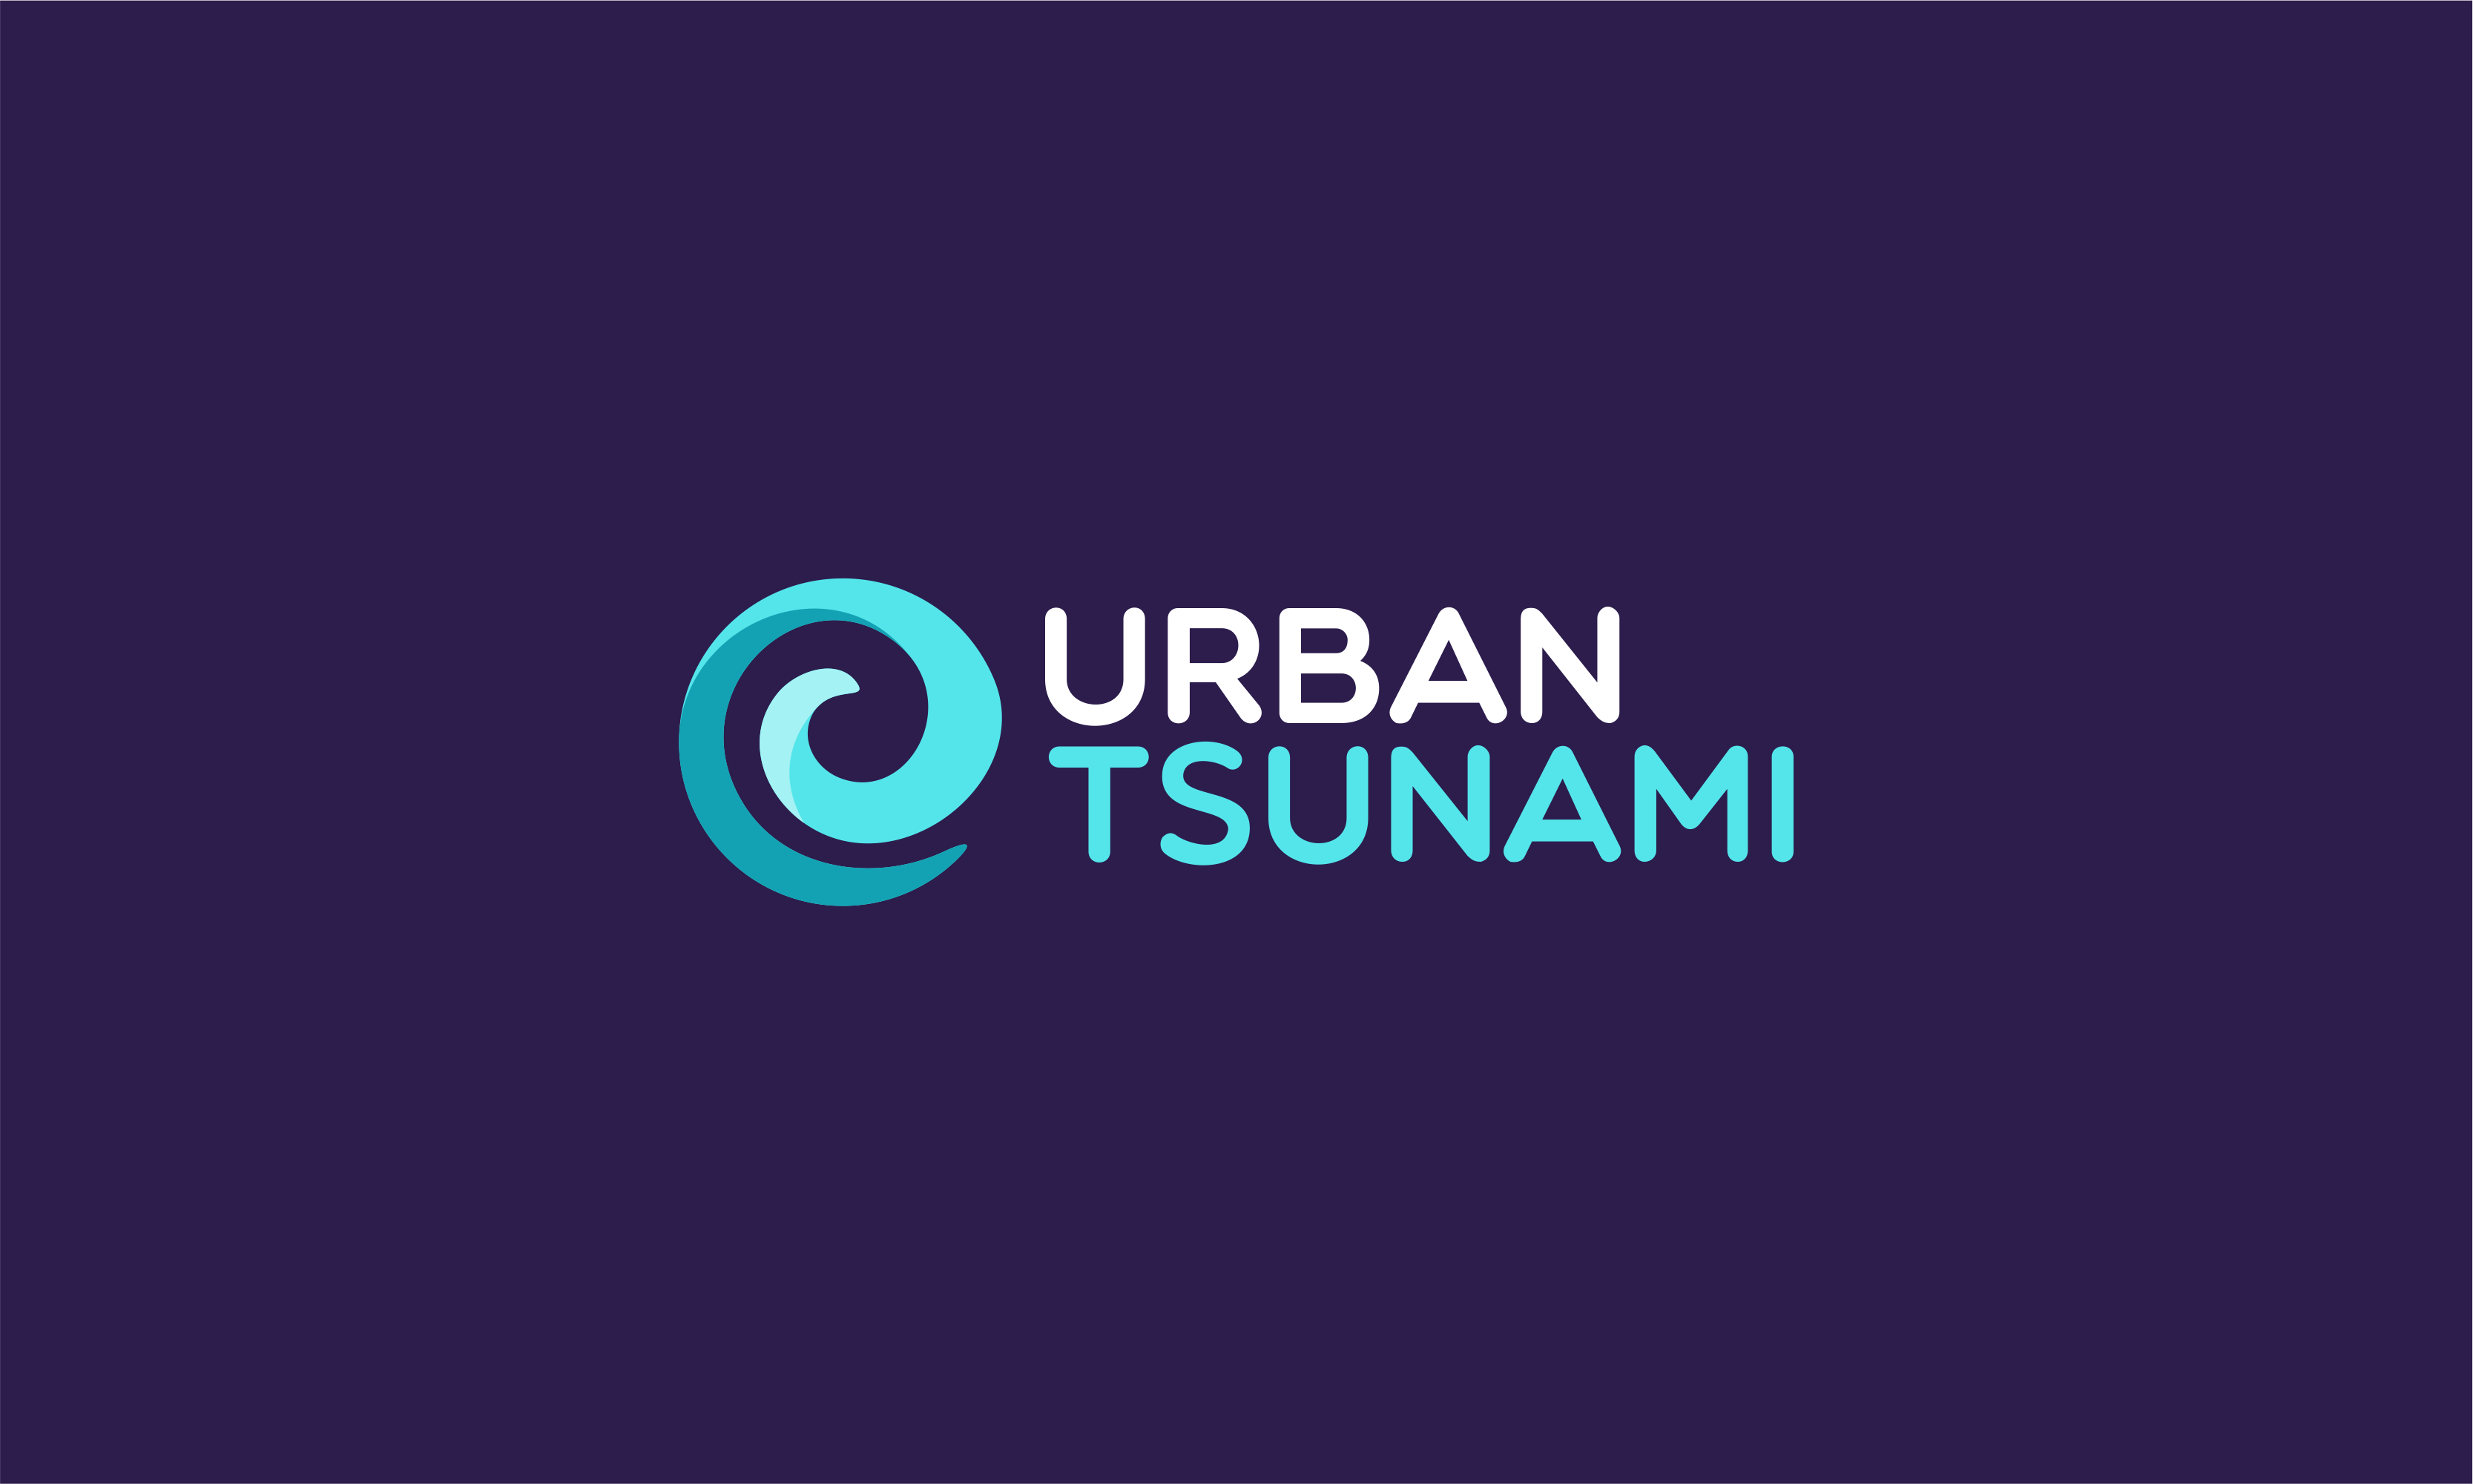 Urbantsunami